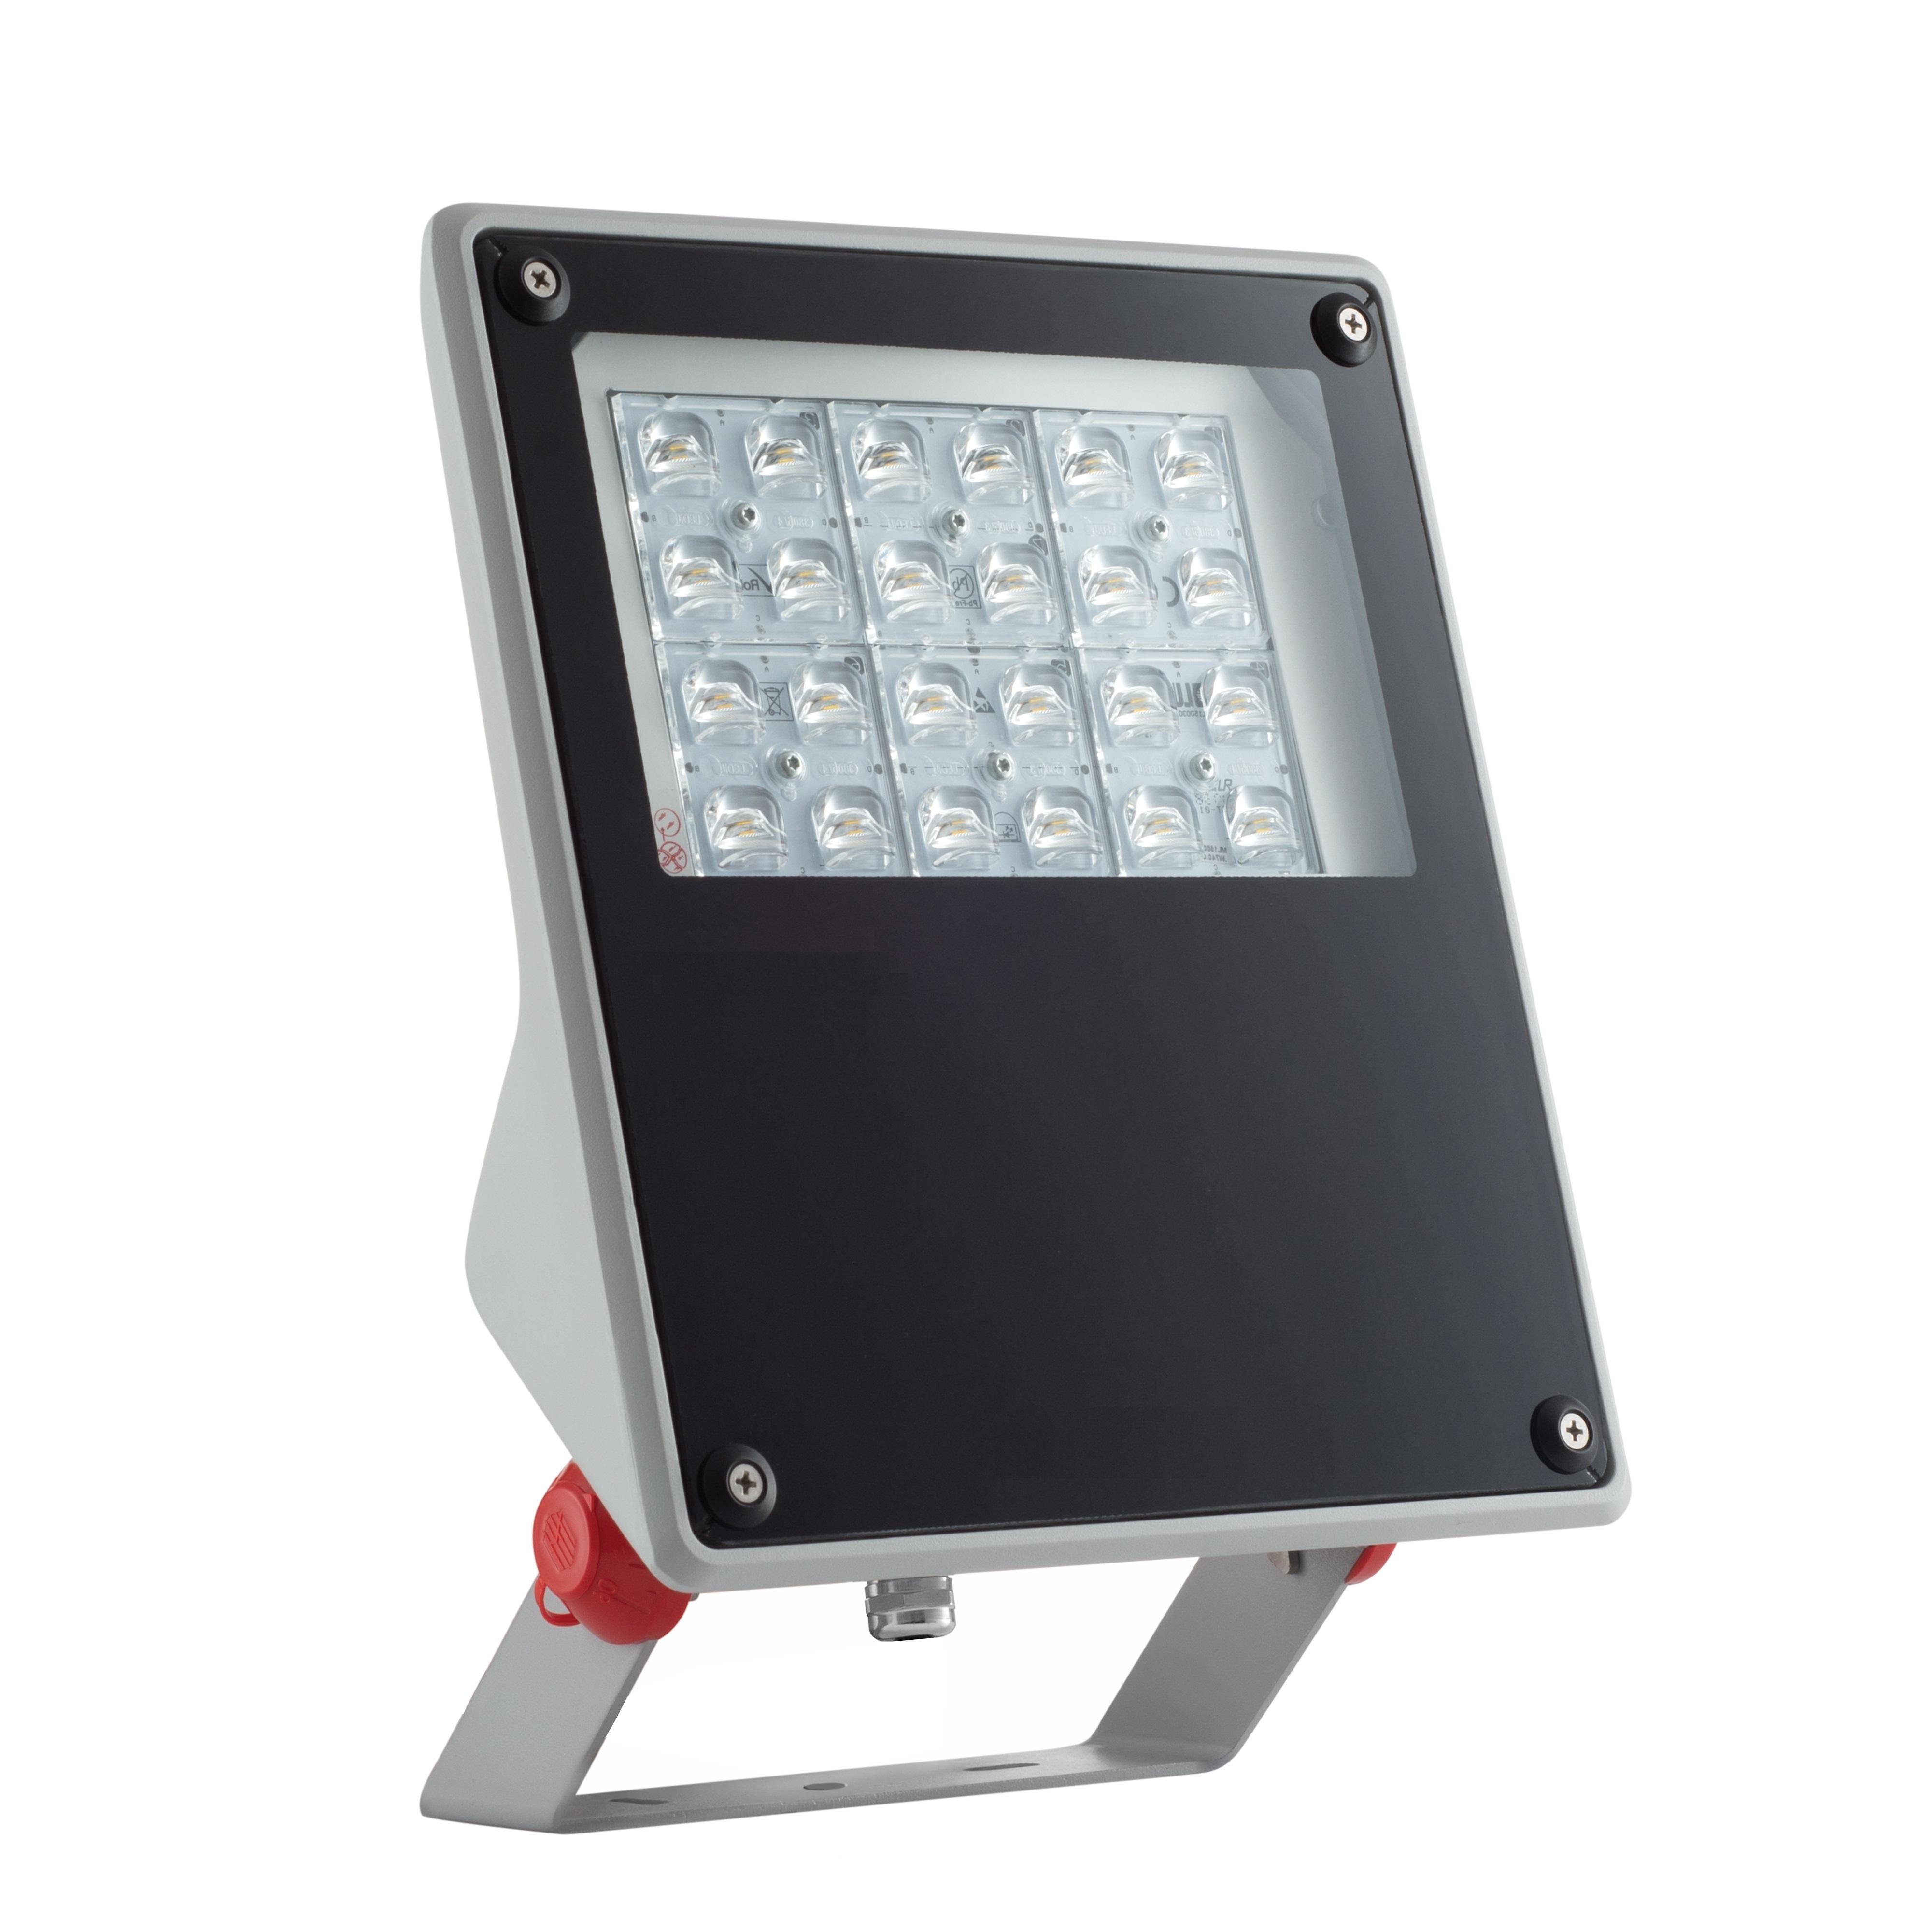 1 Stk FORCA LED Mini 25W 3300lm 4000K EVG IP65 25Ëšsymmetrisch grau LIG5L01111